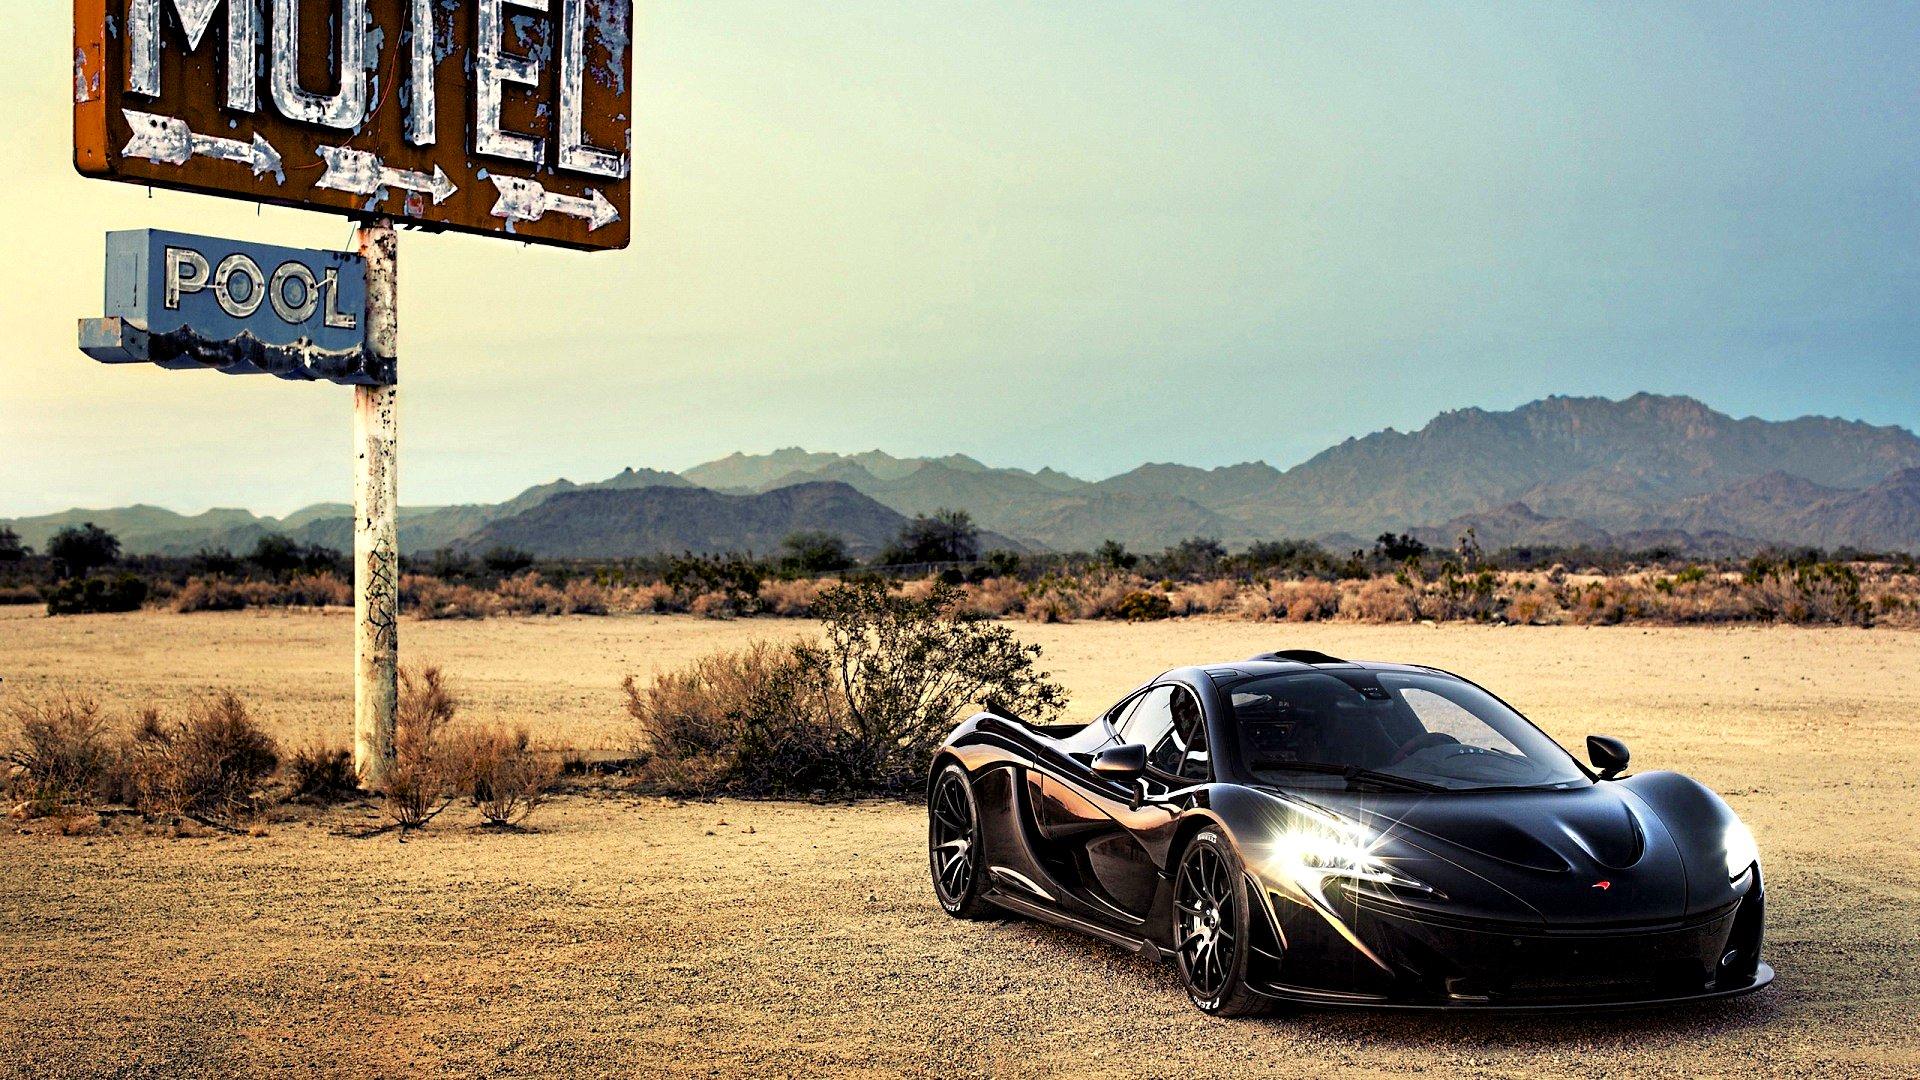 McLaren P1 Full HD Wallpaper And Background Image